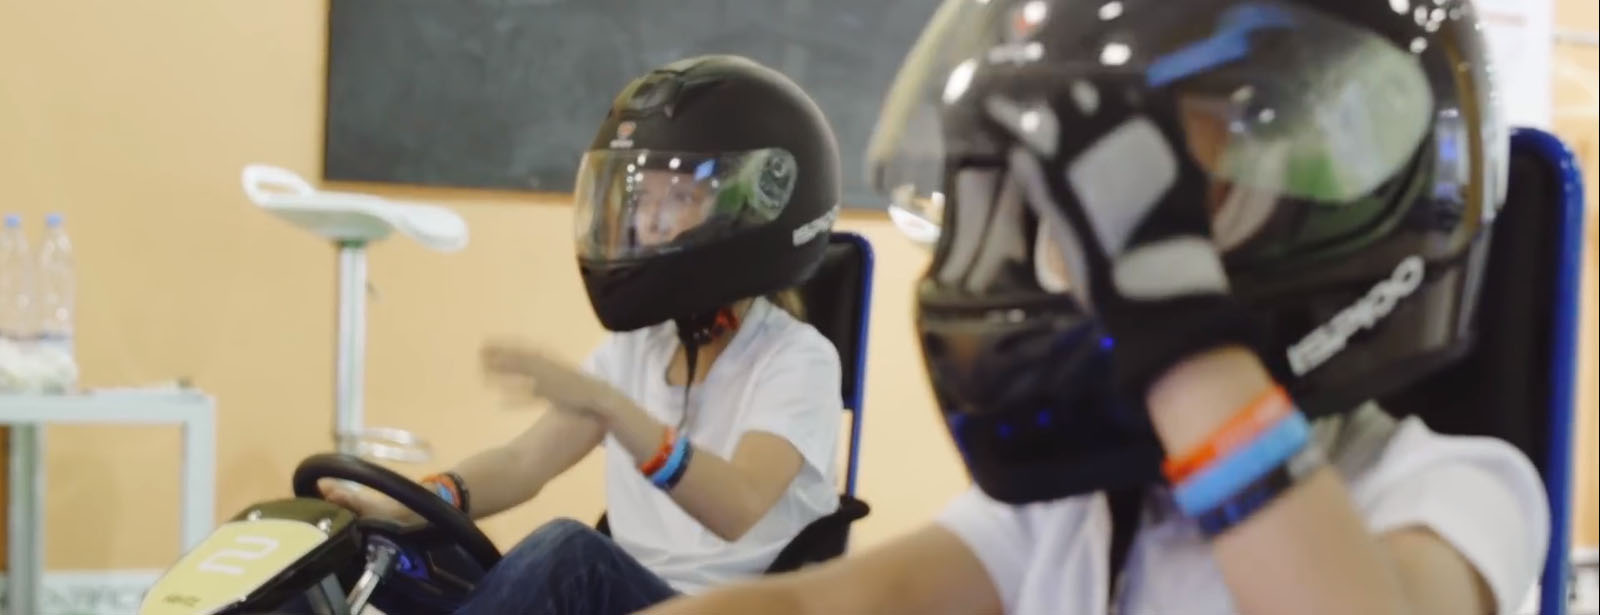 Blue shock race karting leasing